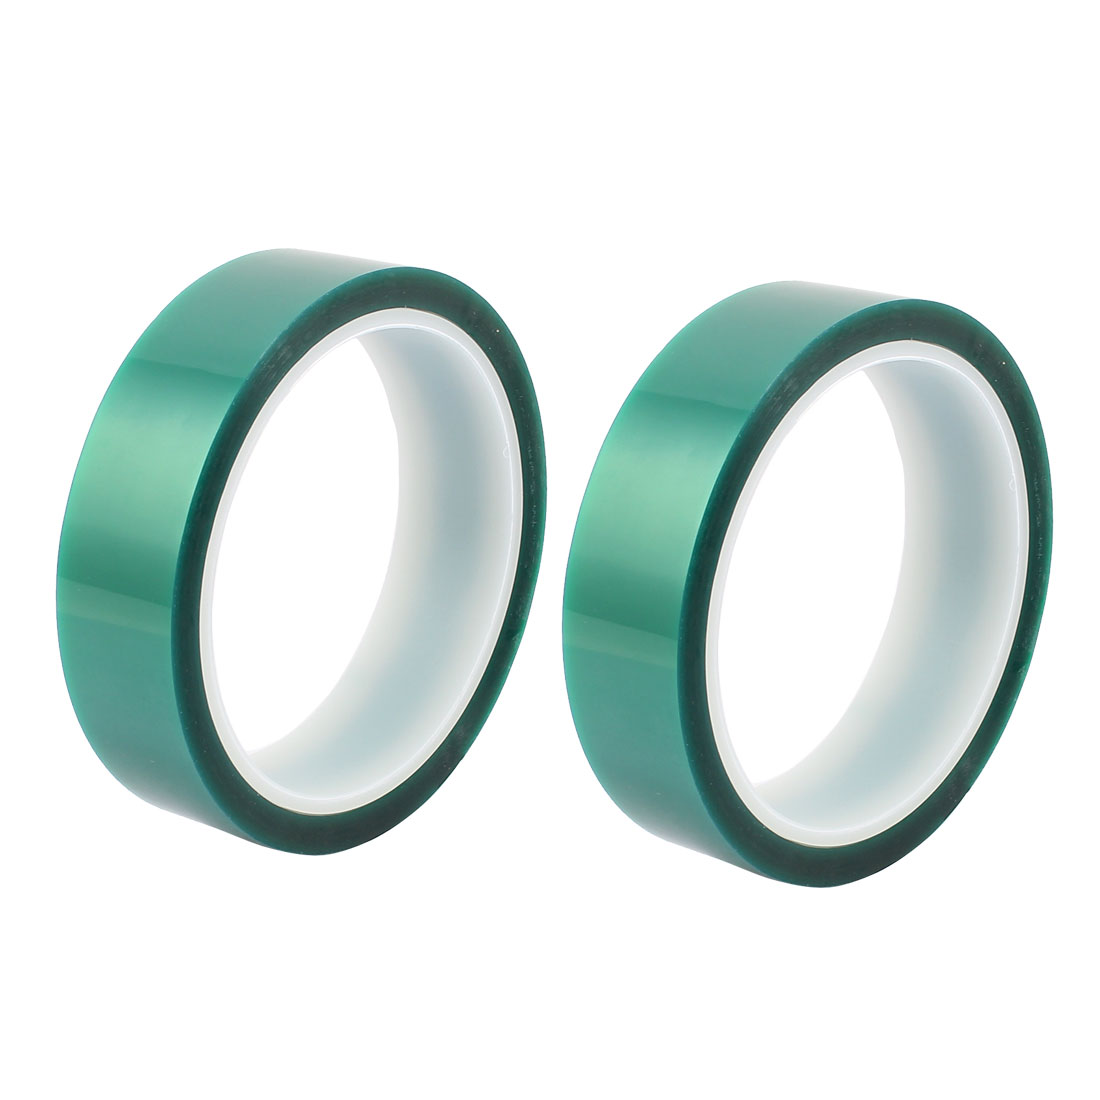 2pcs 25mm Width 33M Long Green PET High Temperature Heat Resistant PCB Solder Tape